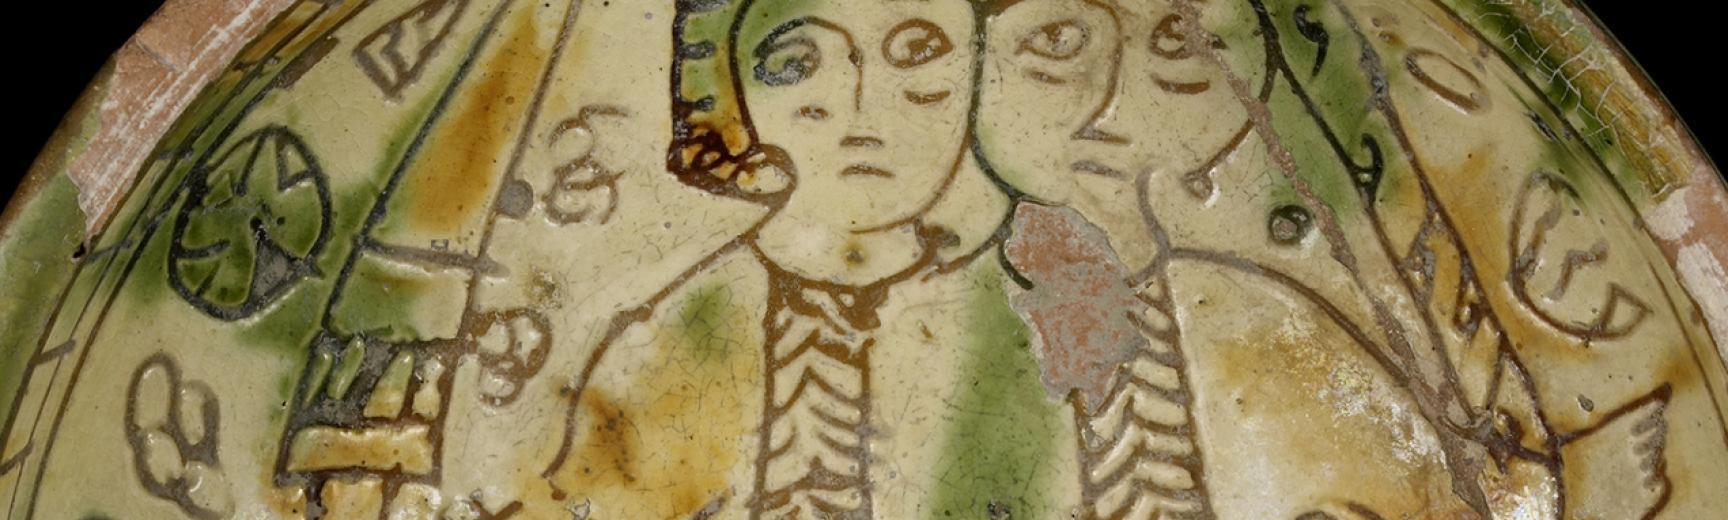 ashmolean medieval cyprus